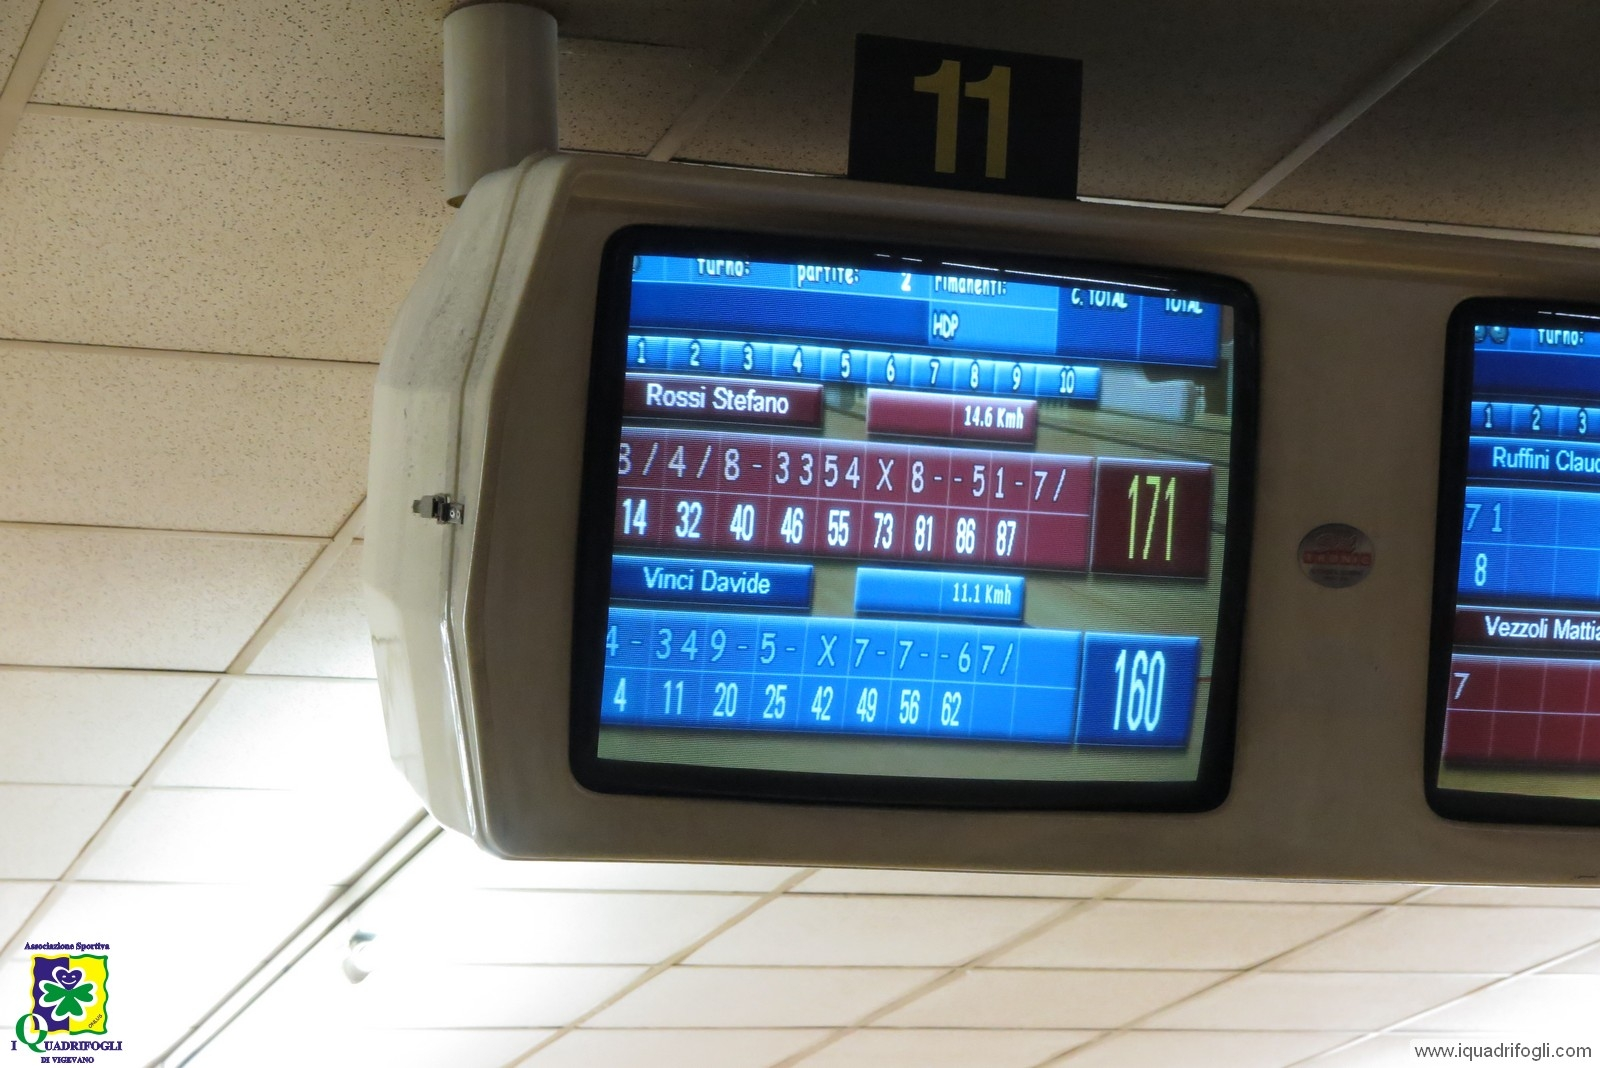 Bowling Nerviano 2019 - Regionali - 130